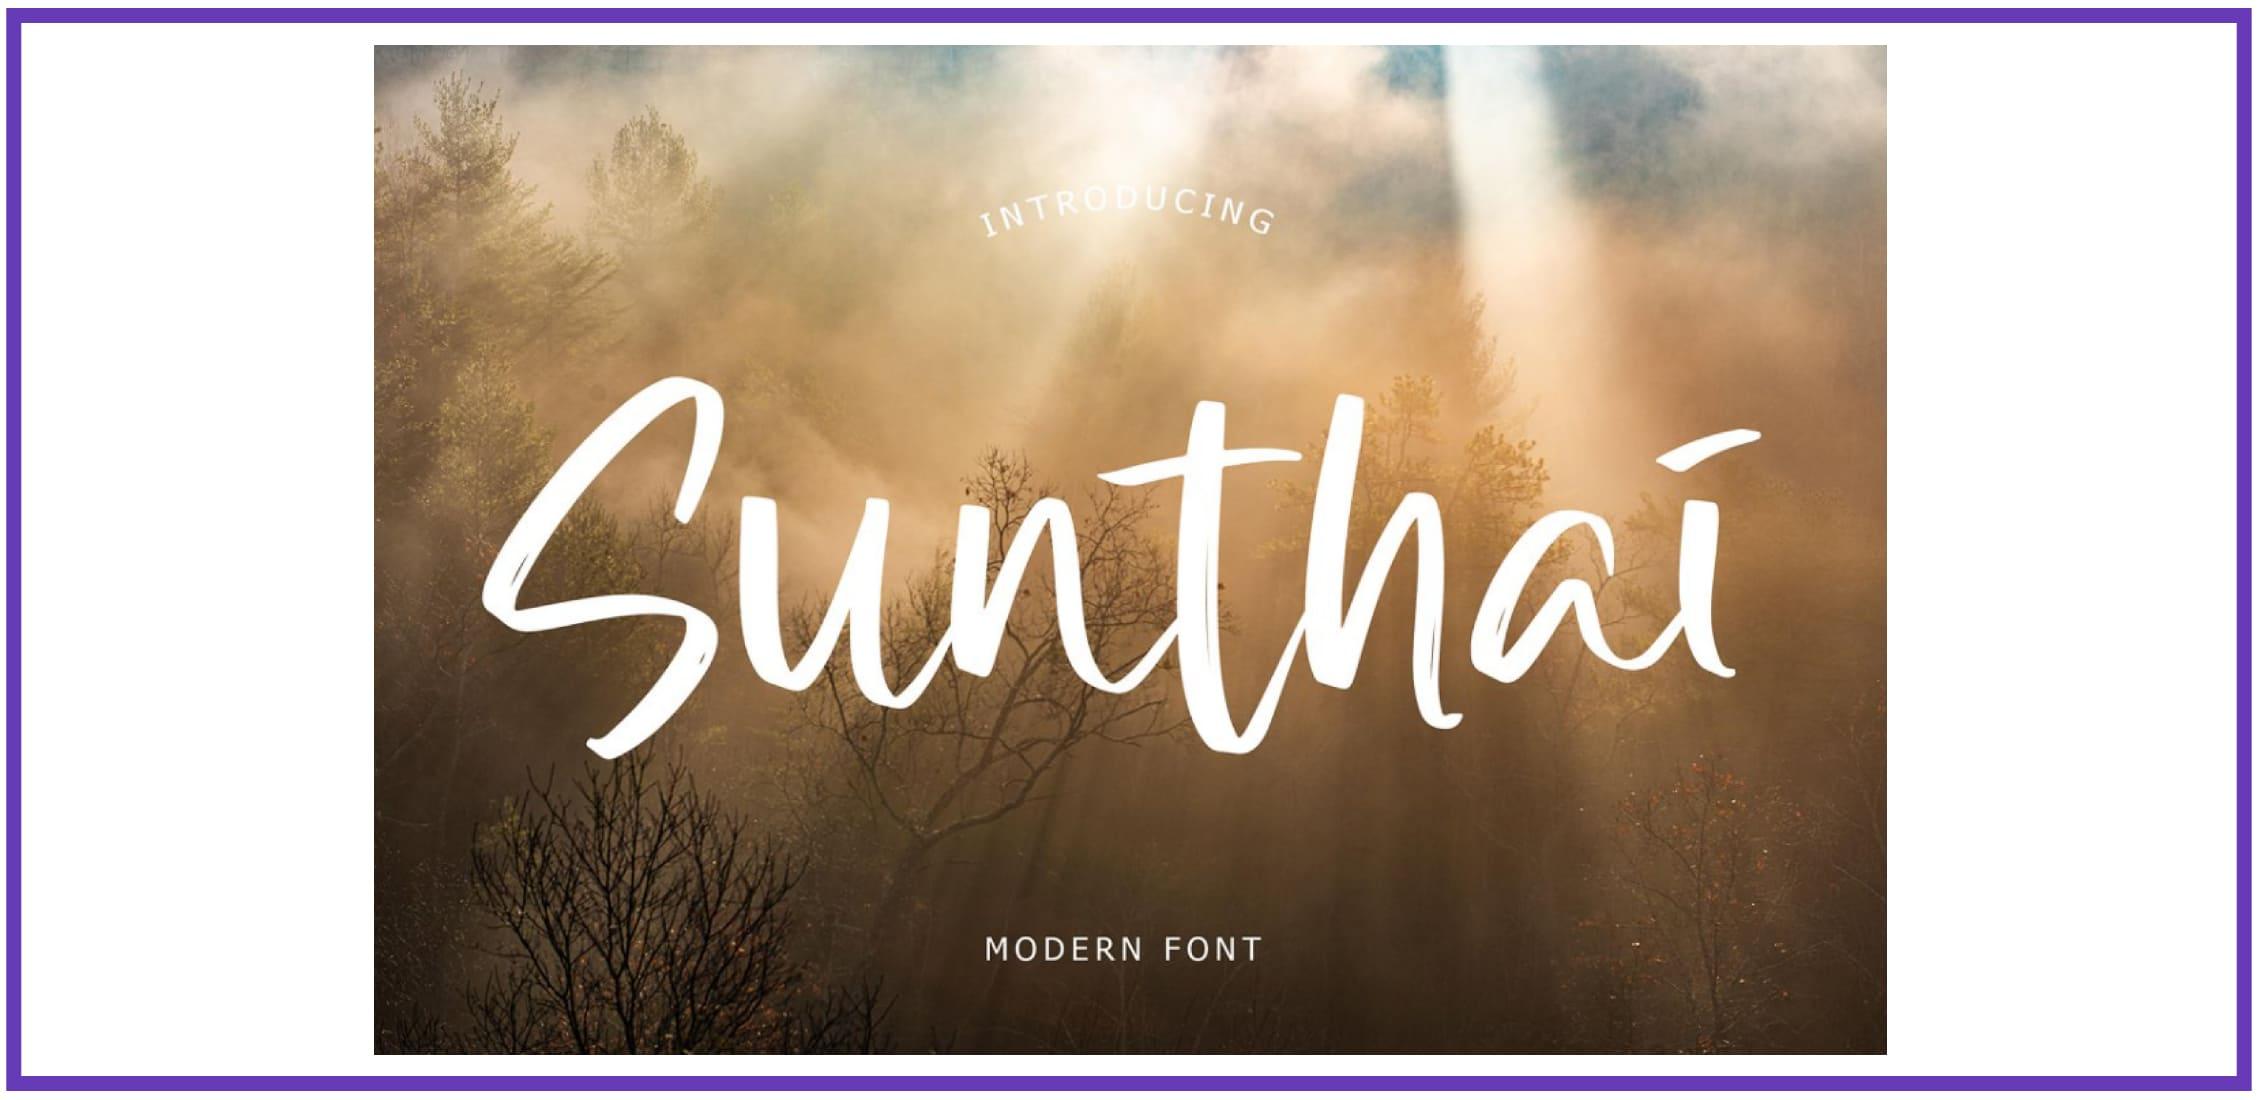 Sunthai Modern Font By Formatika Studio. Best Beachy Fonts.